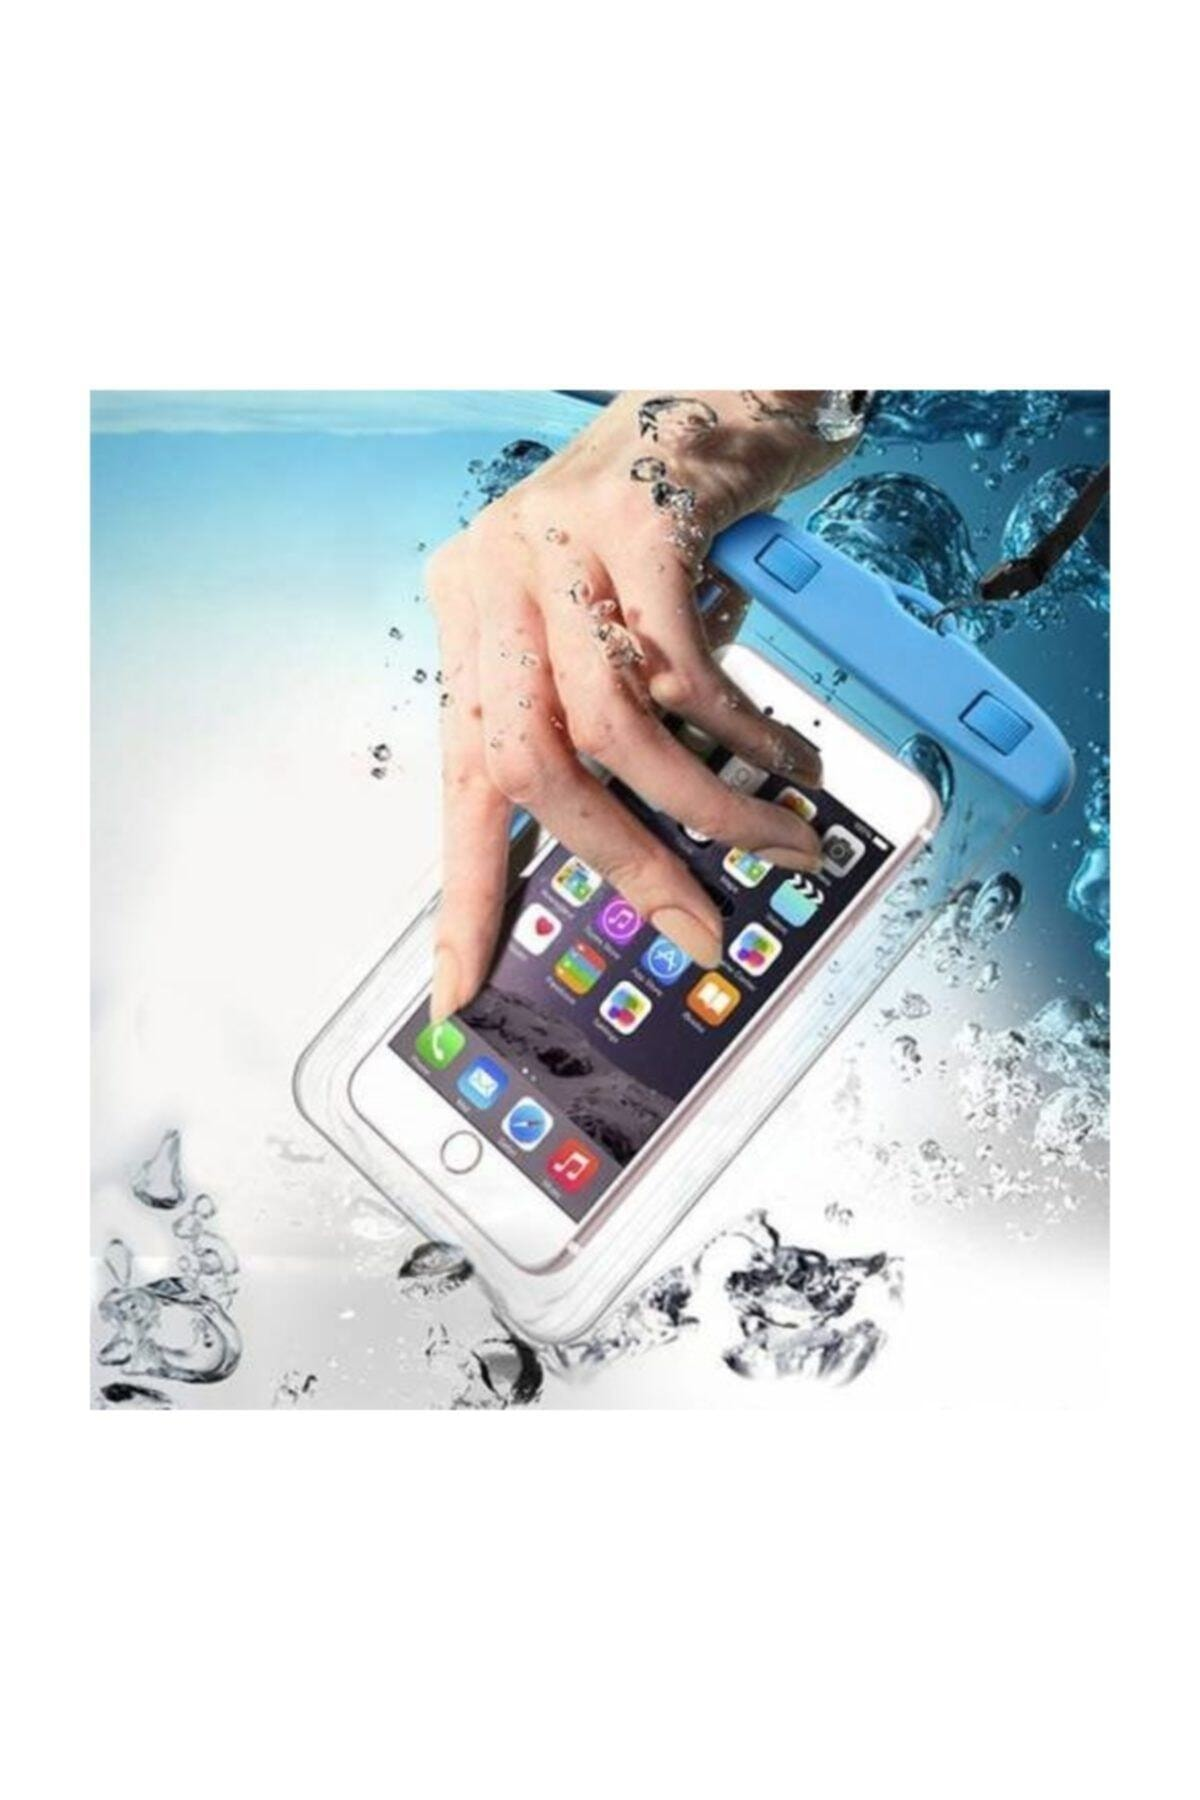 MRÇ Su Geçirmez Kılıf Askılı Tüm Telefonlarla Uyumlu 1